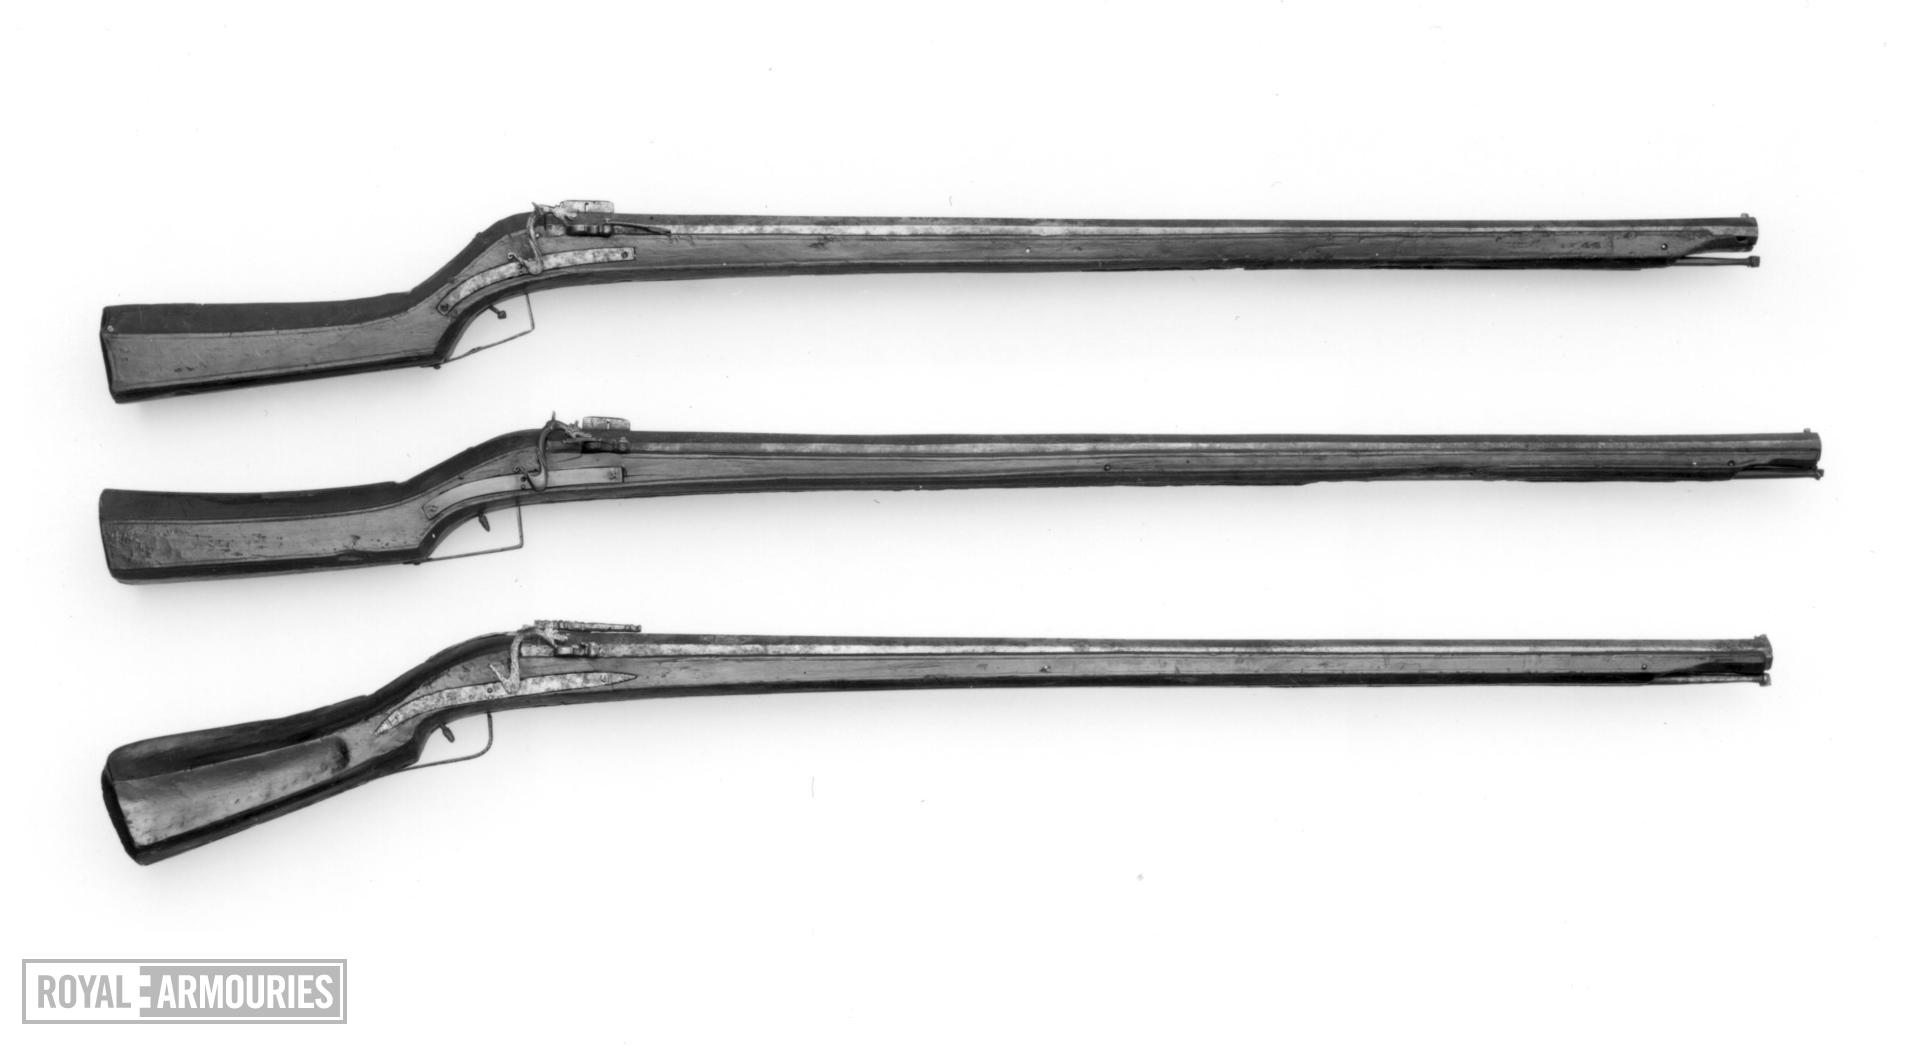 Matchlock muzzle-loading musket Made in Gardone, Brescia